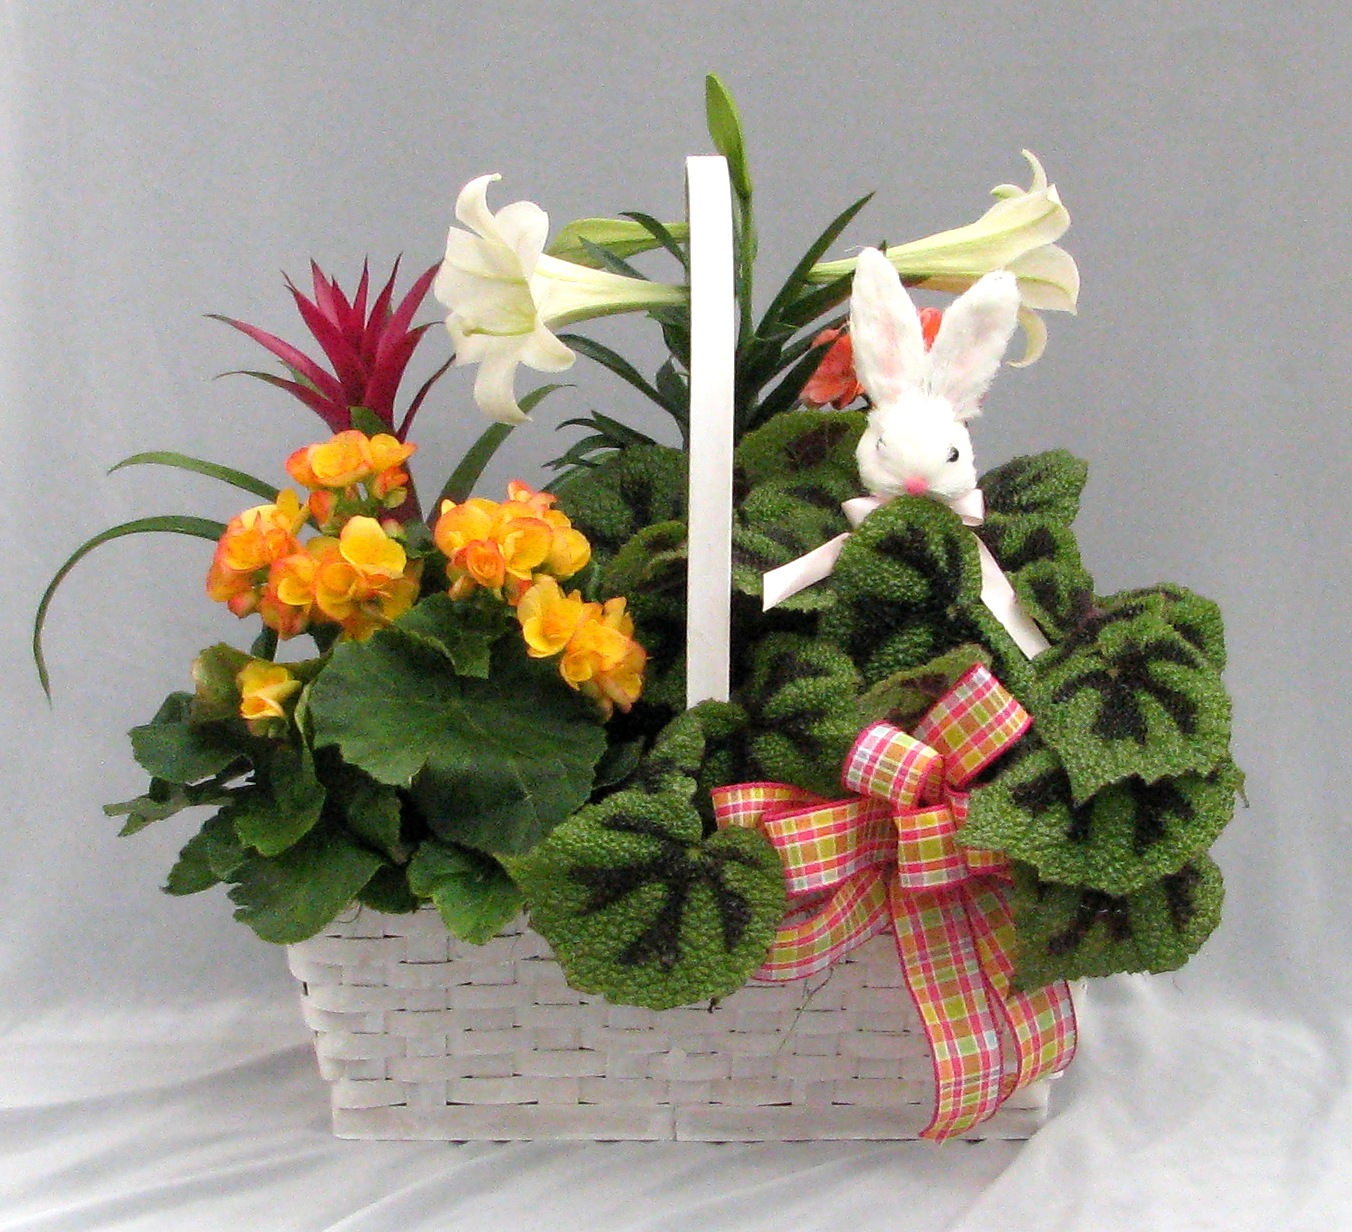 Countryside Flower Shop, Nursery & Garden Center